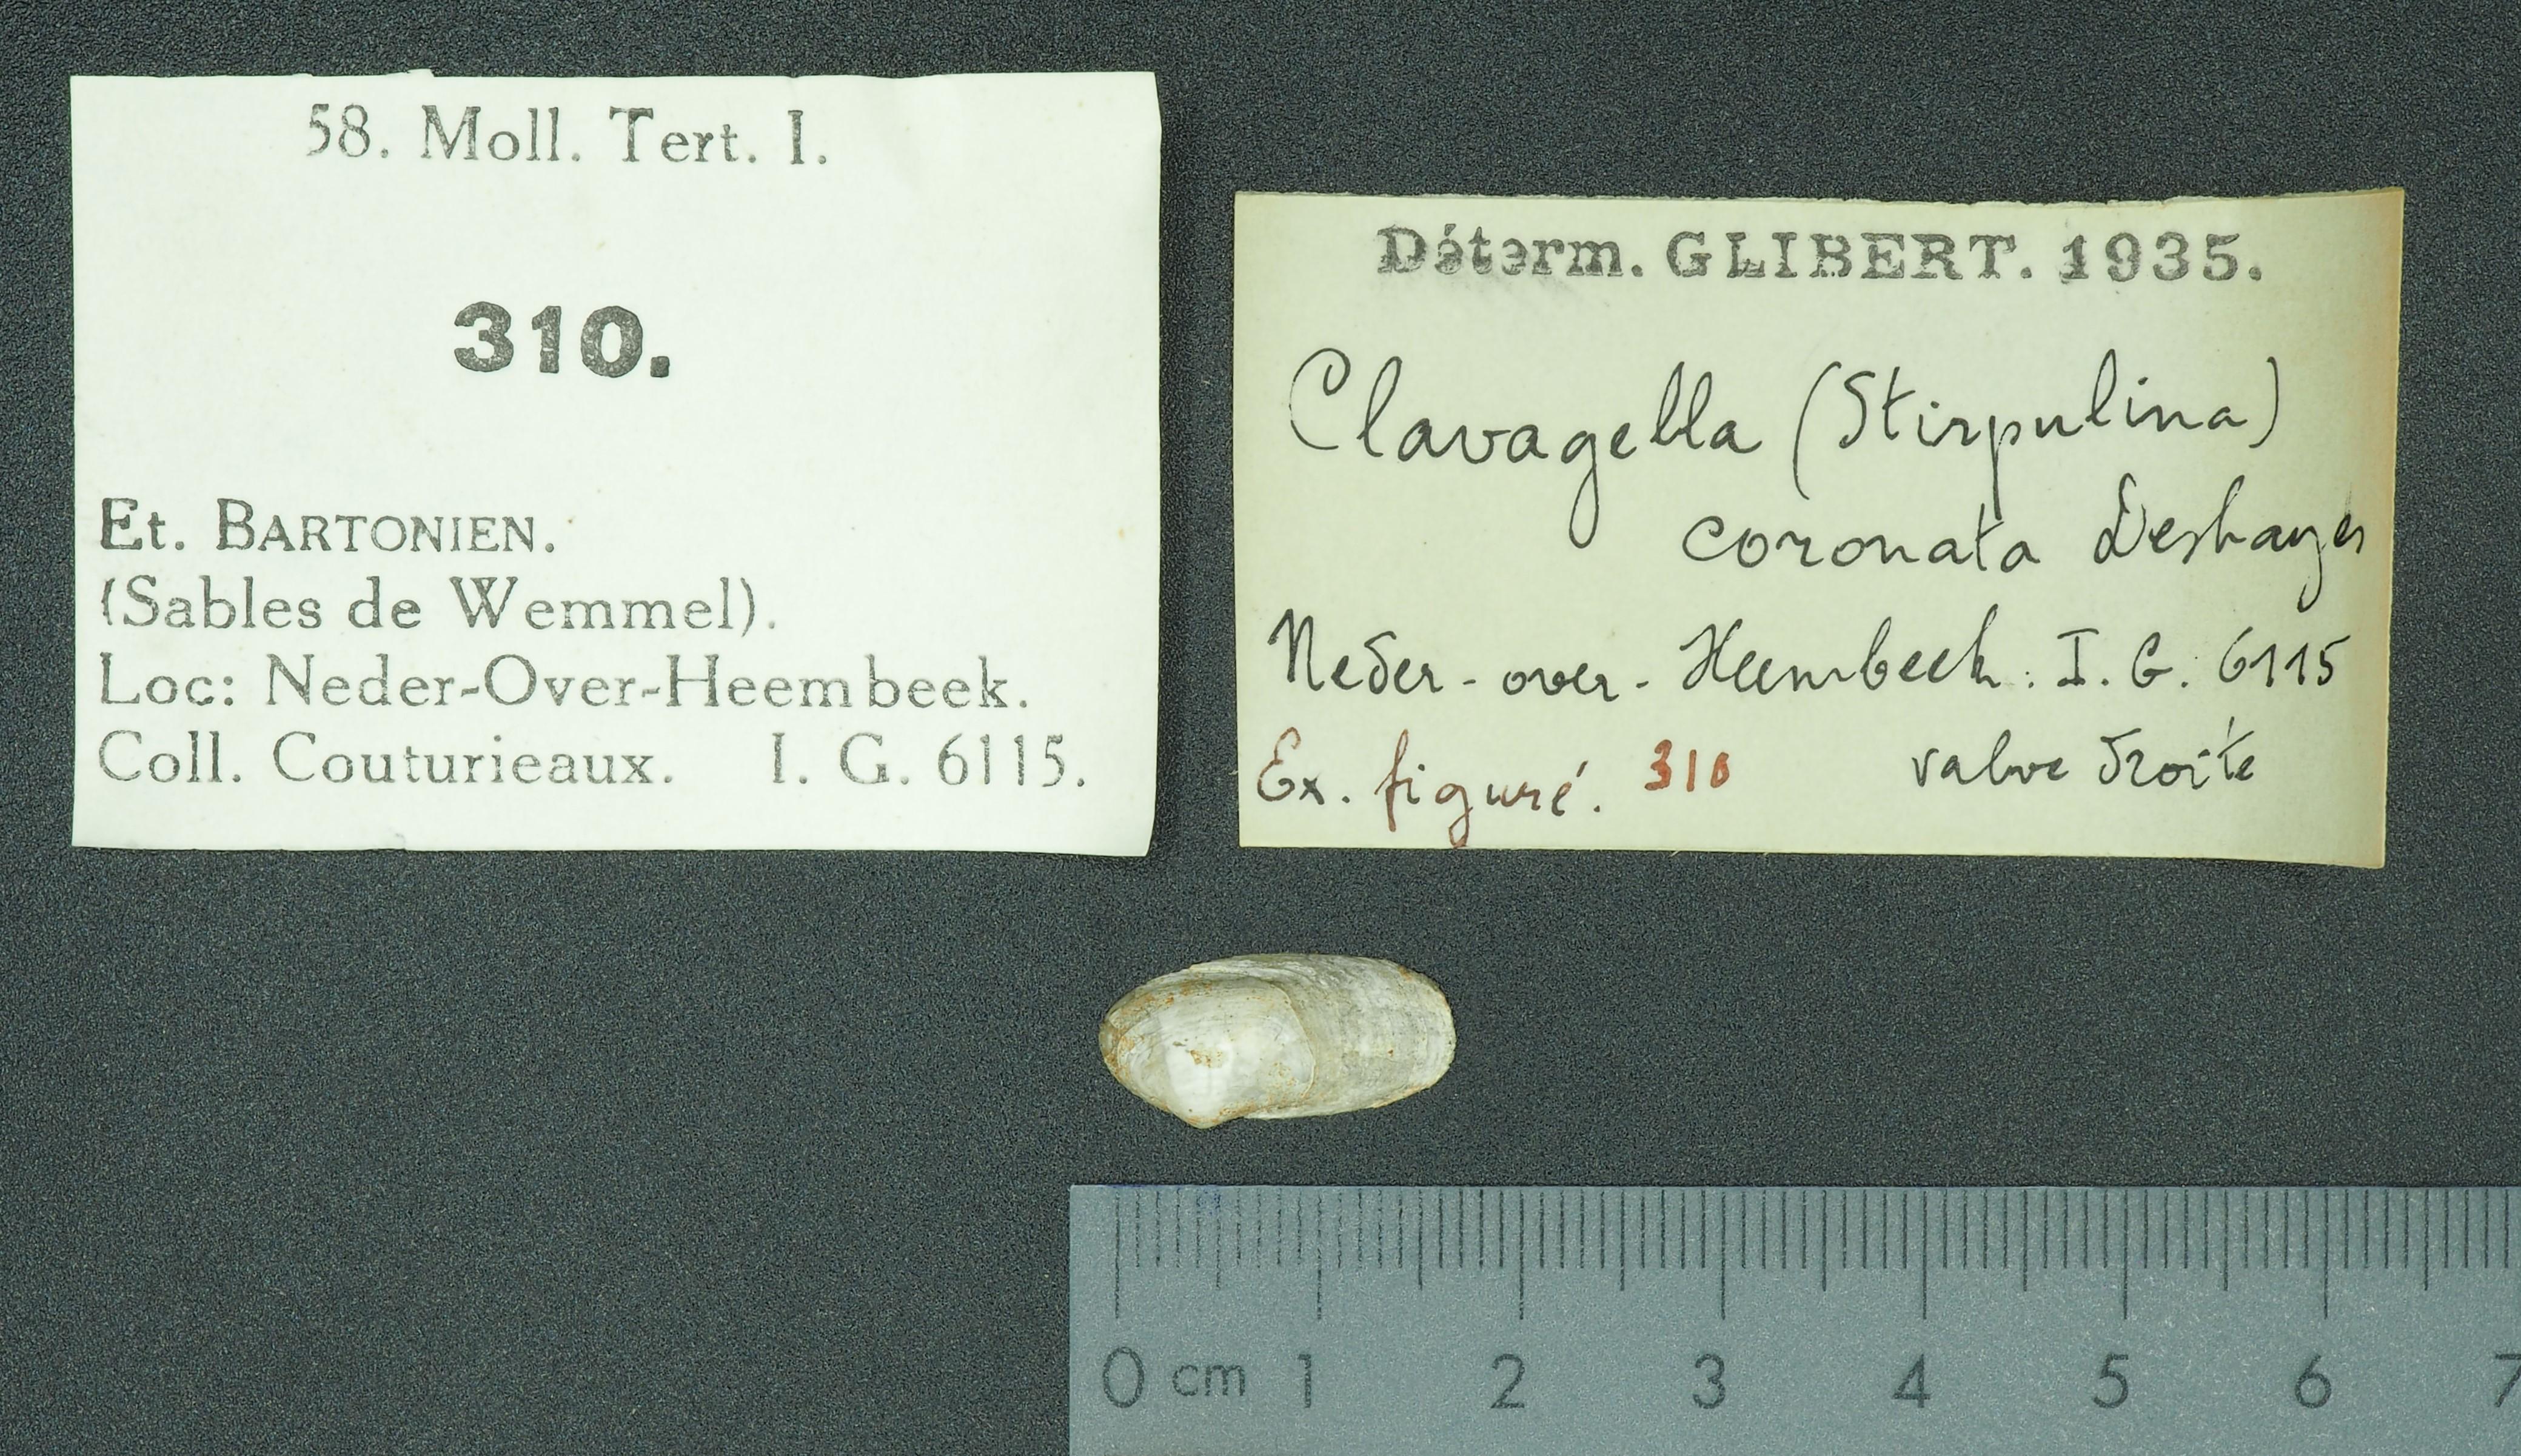 RBINS 310 - Clavagella coronata fig Lb